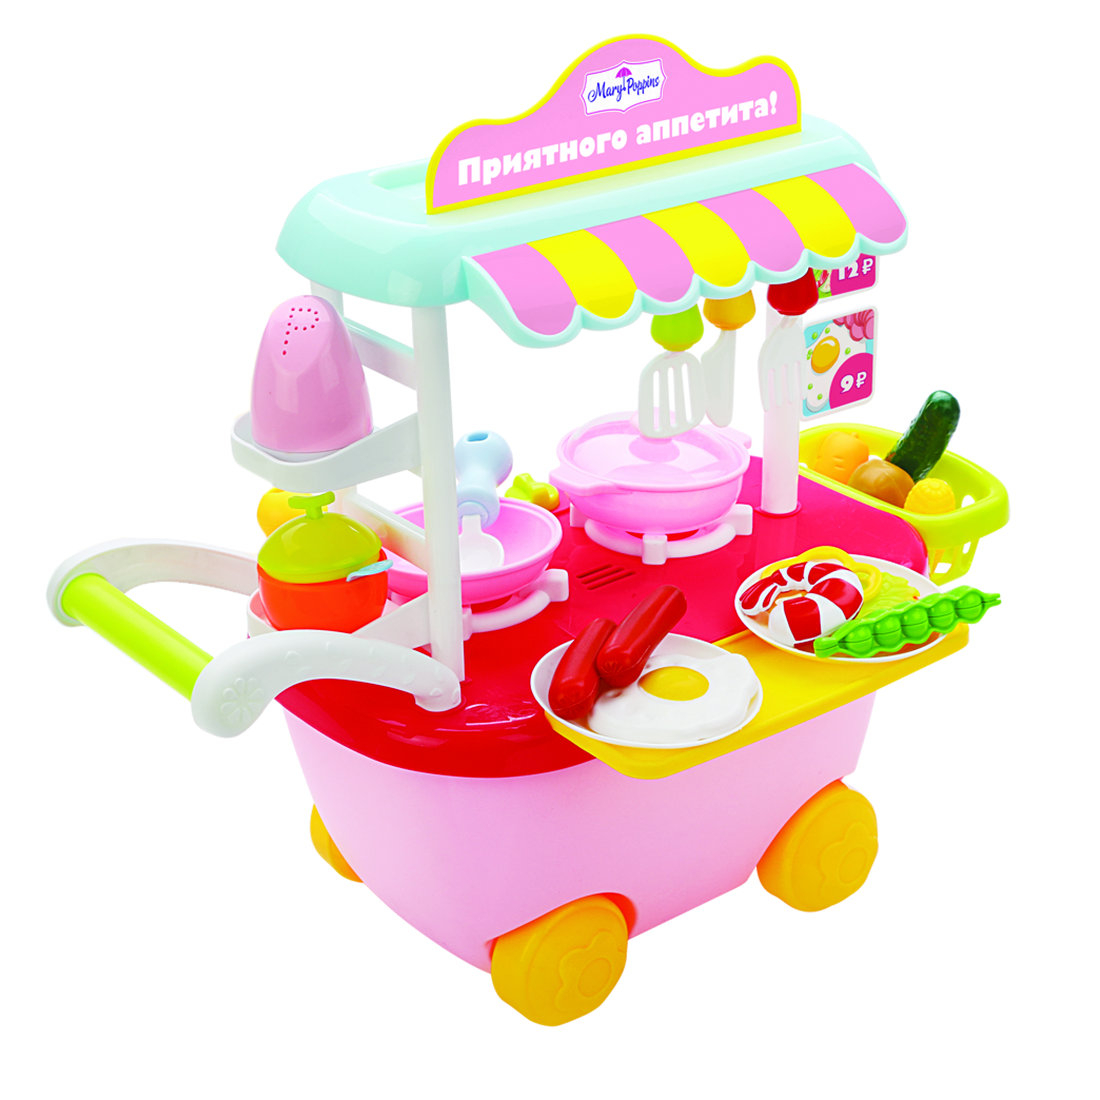 Мебель для кукол Mary Poppins Кафе на колесах Приятного аппетита